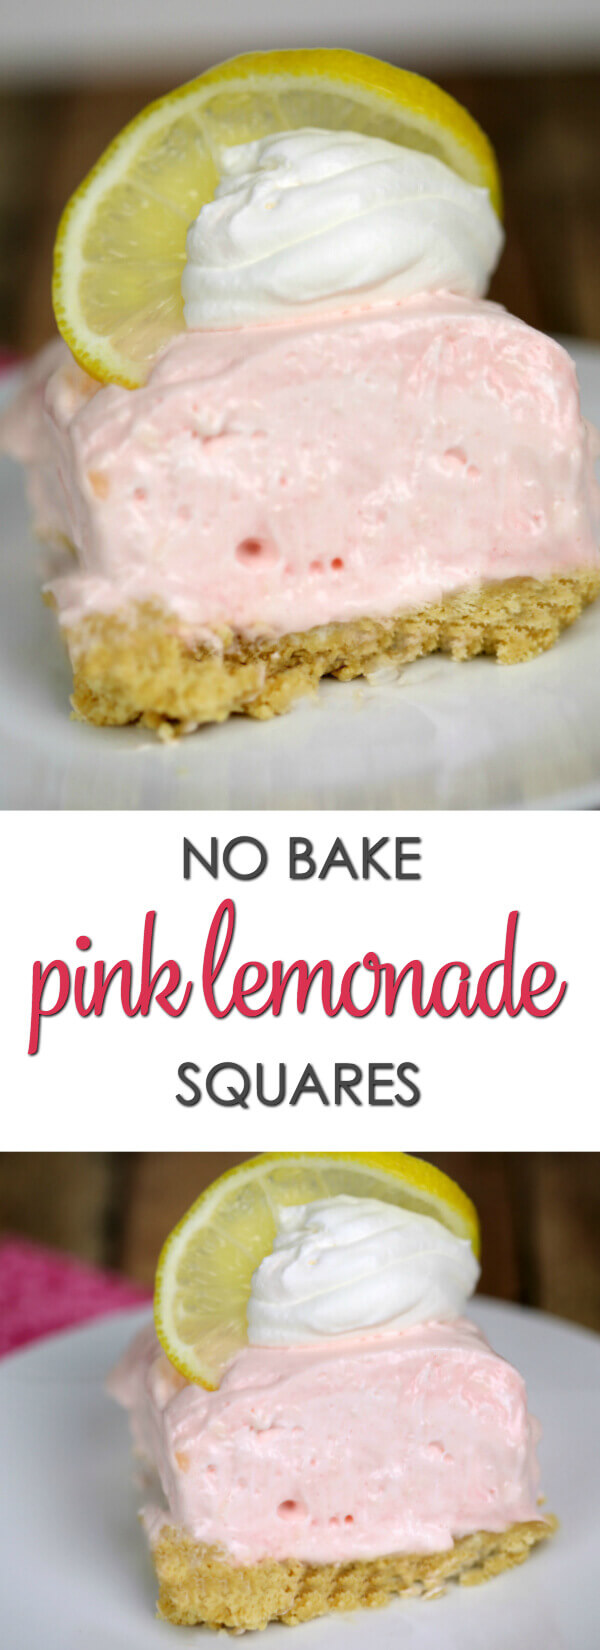 No Bake Pink Lemonade Squares - this is my all time favorite easy lemon dessert recipe